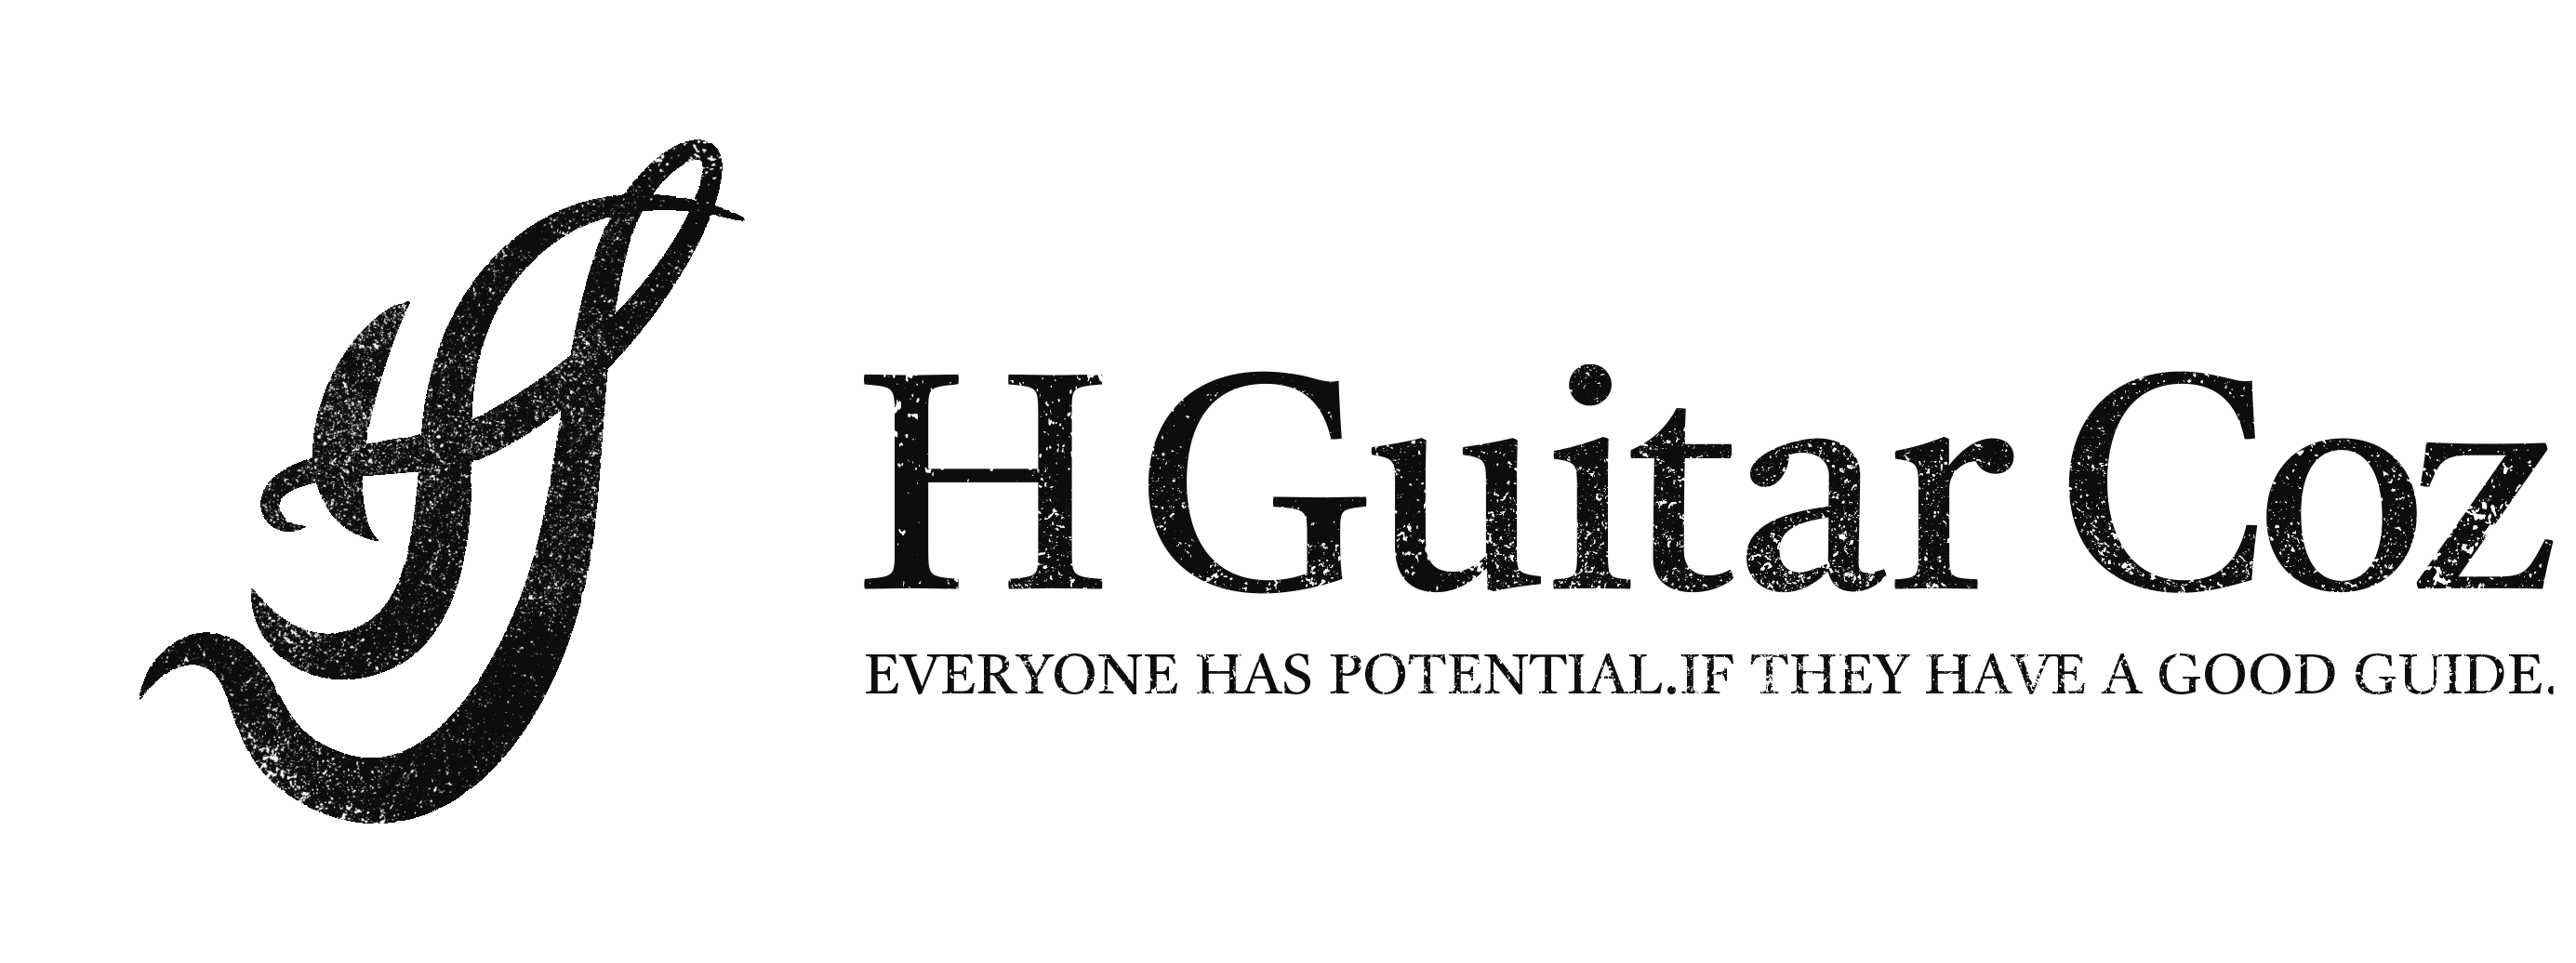 HguitarCoz